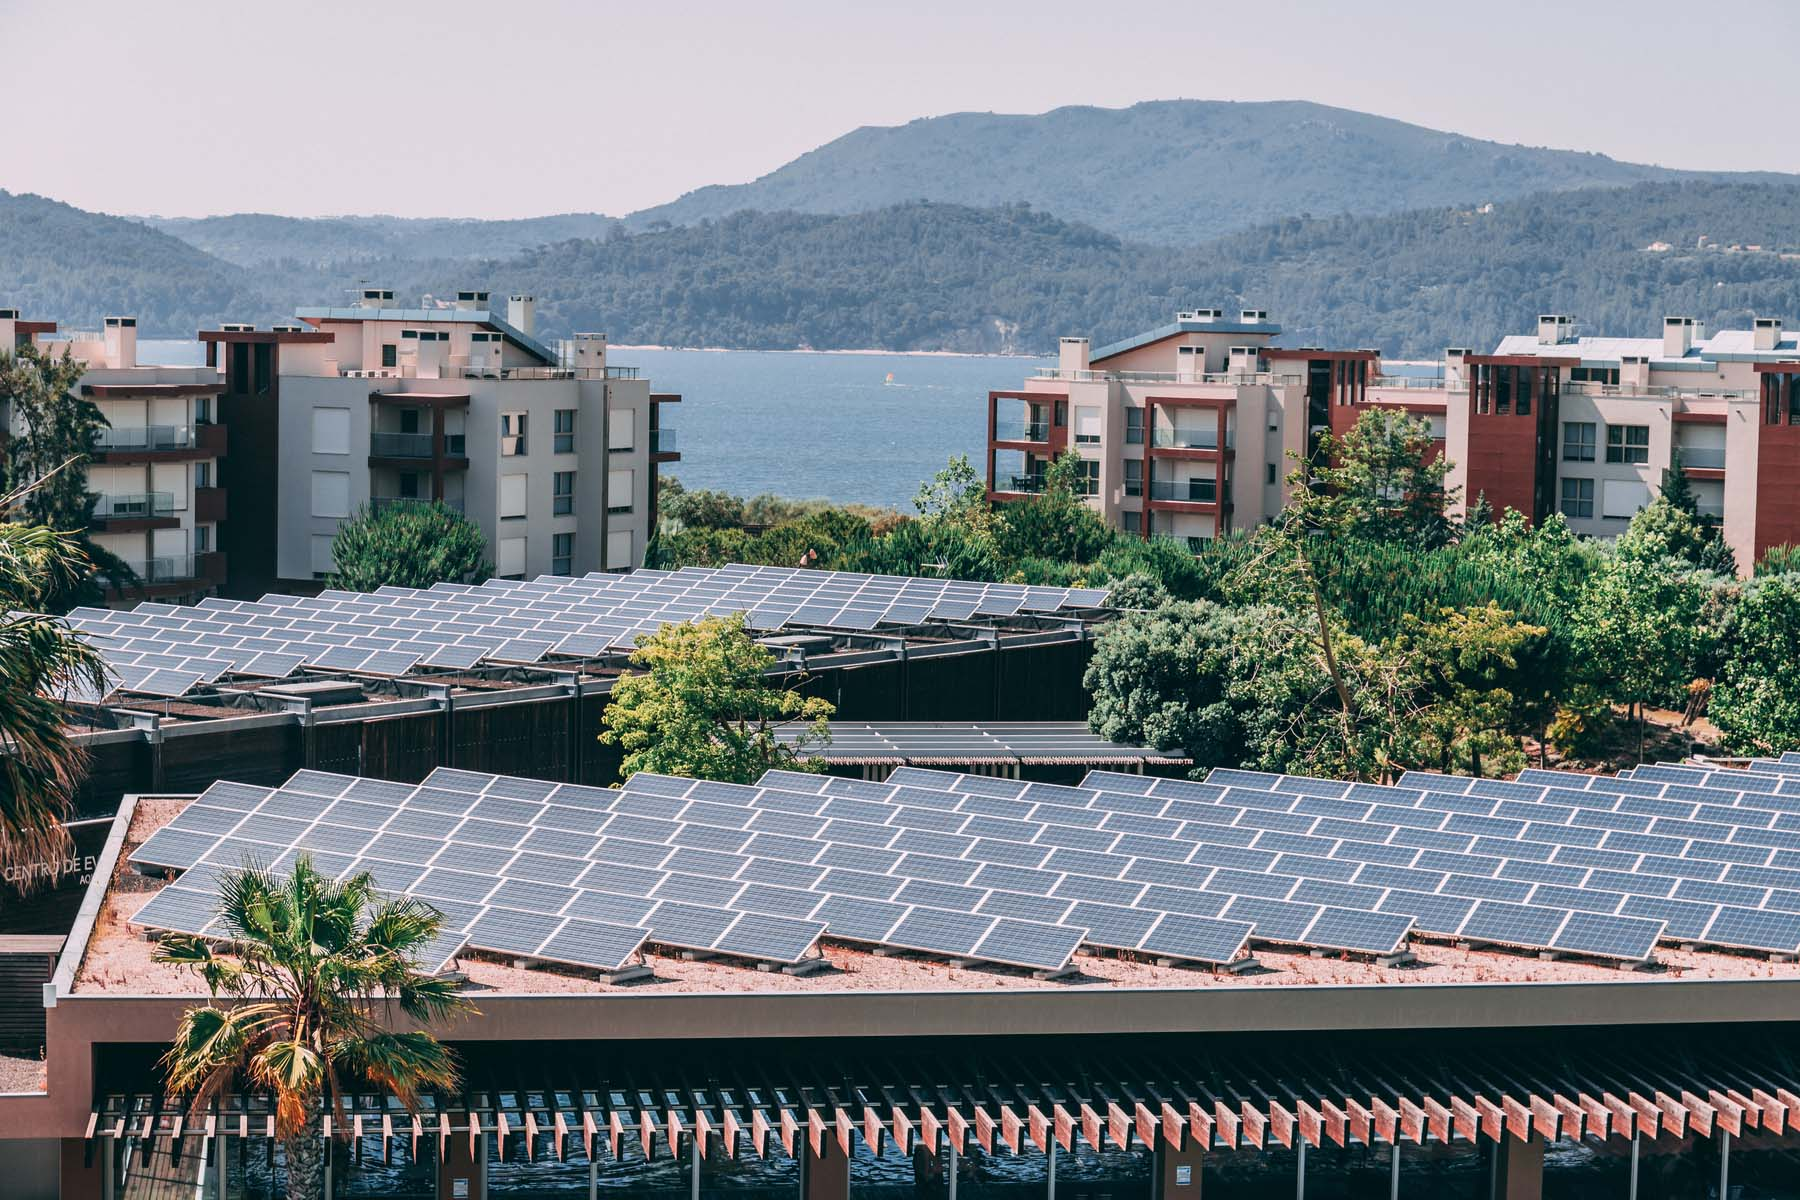 Solar panels Portugal